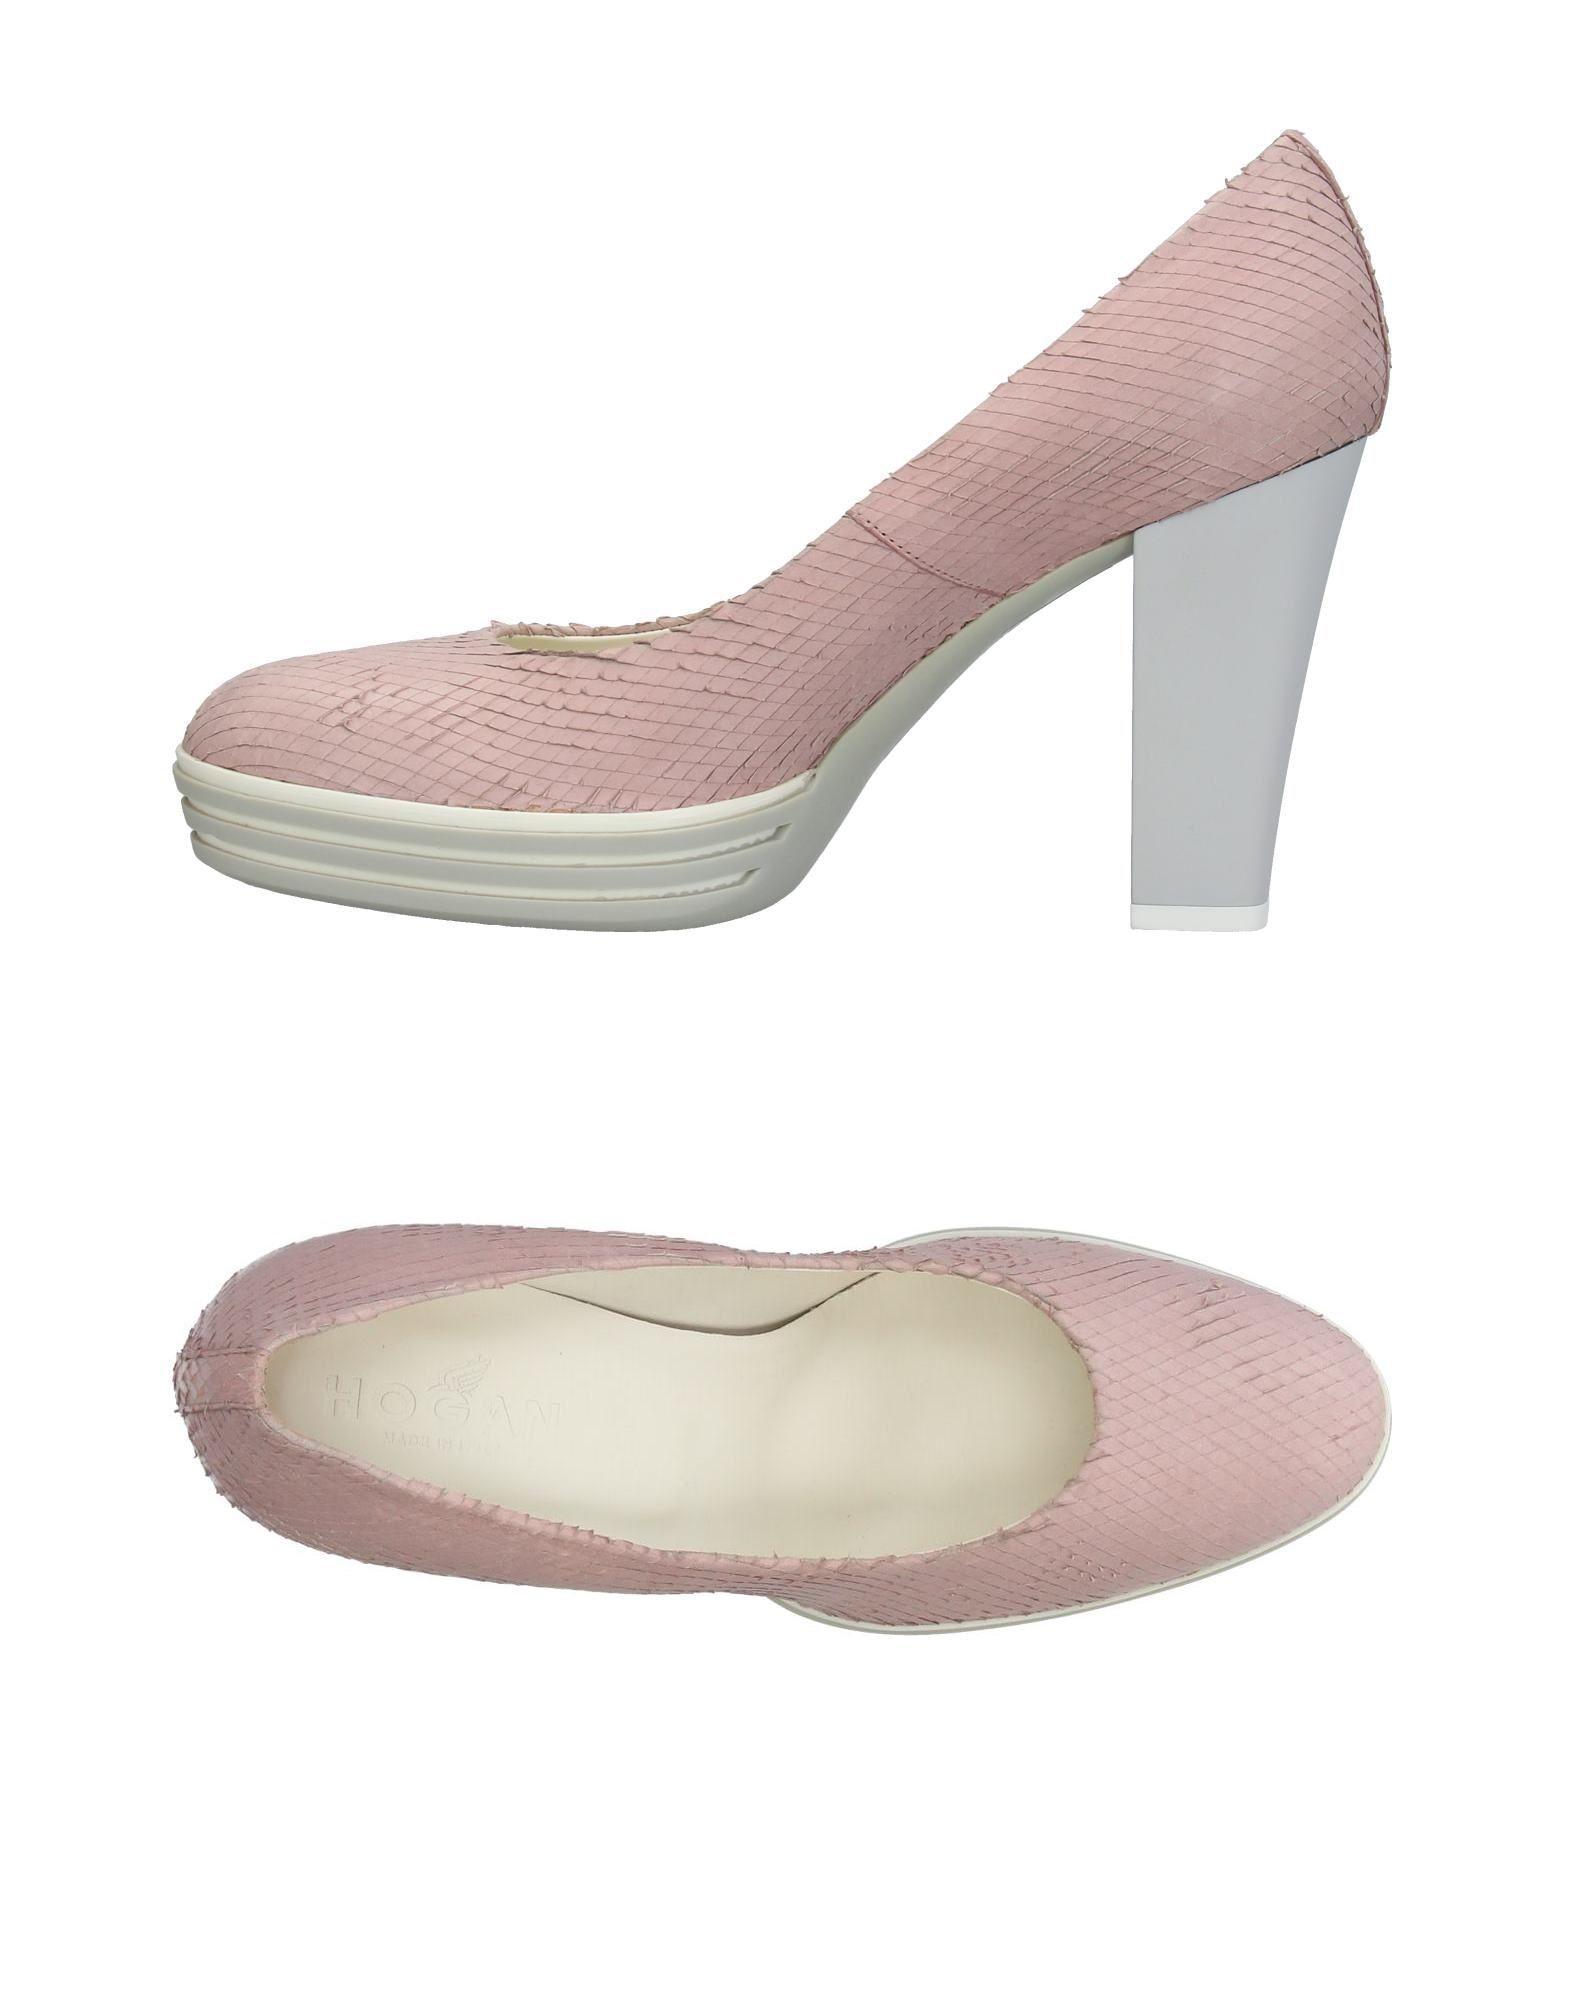 Hogan Pumps Schuhe Damen  11296765UL Heiße Schuhe Pumps c30e29